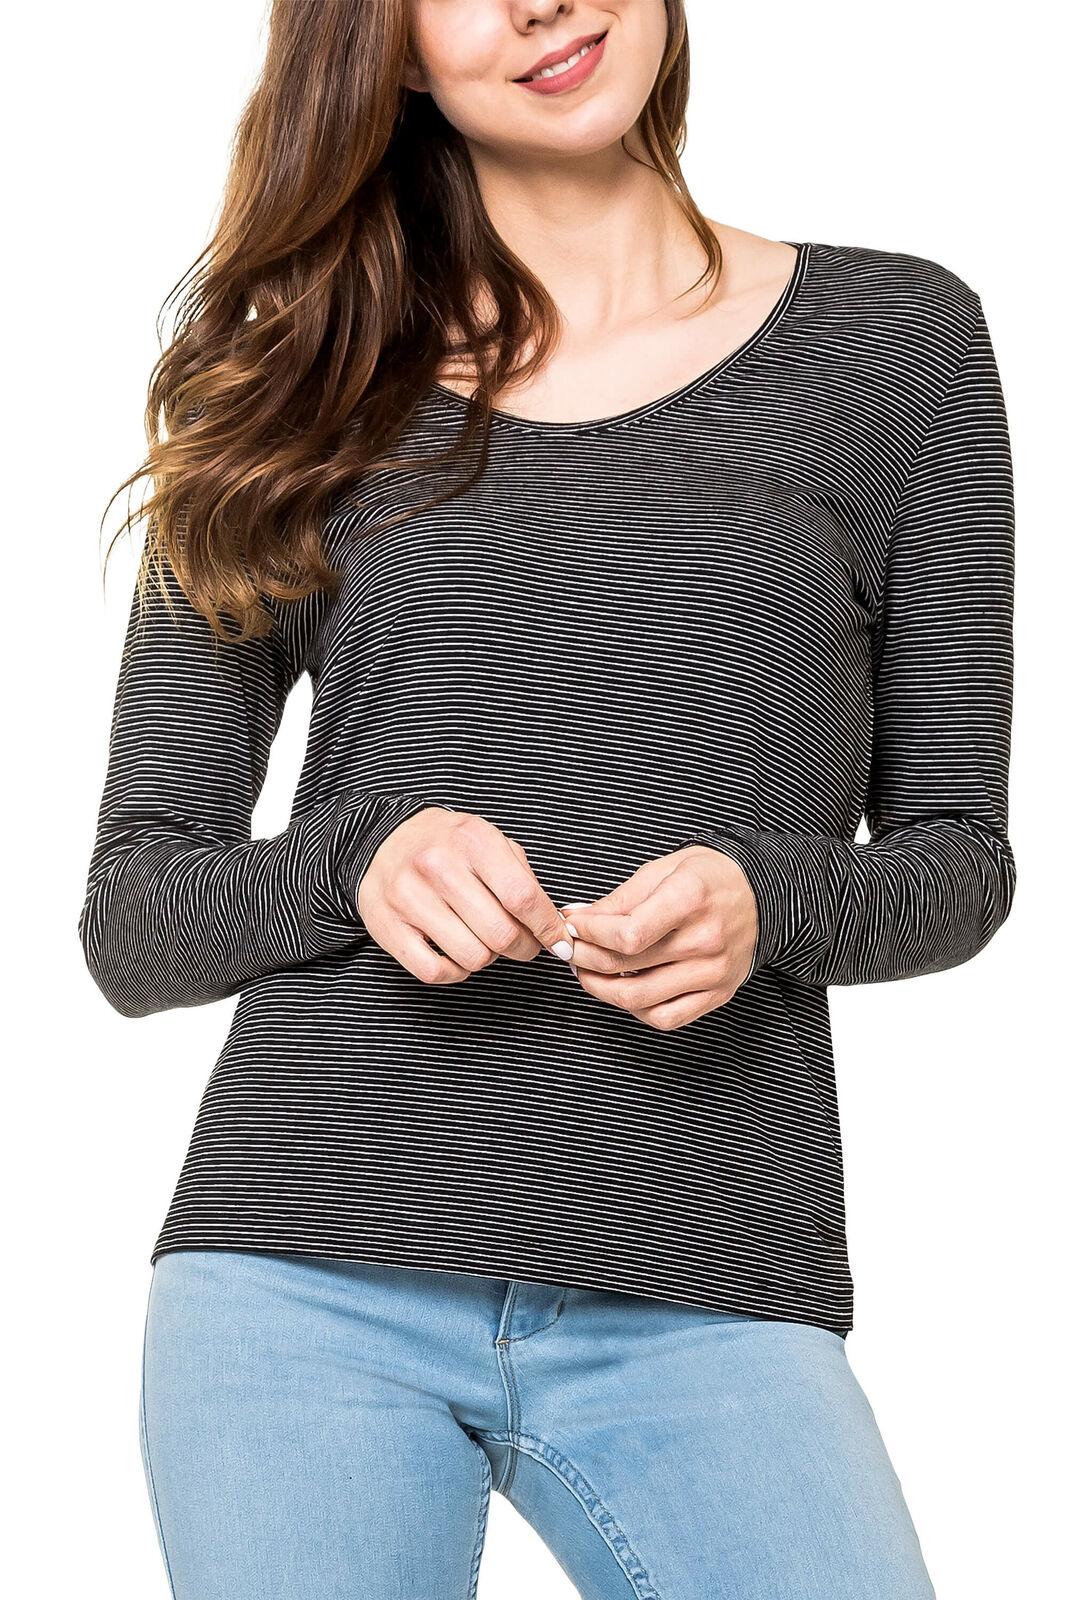 Pieces Damen Langarmshirt Shirt Stretch Basic Damenshirt Damentop Longshirt Top